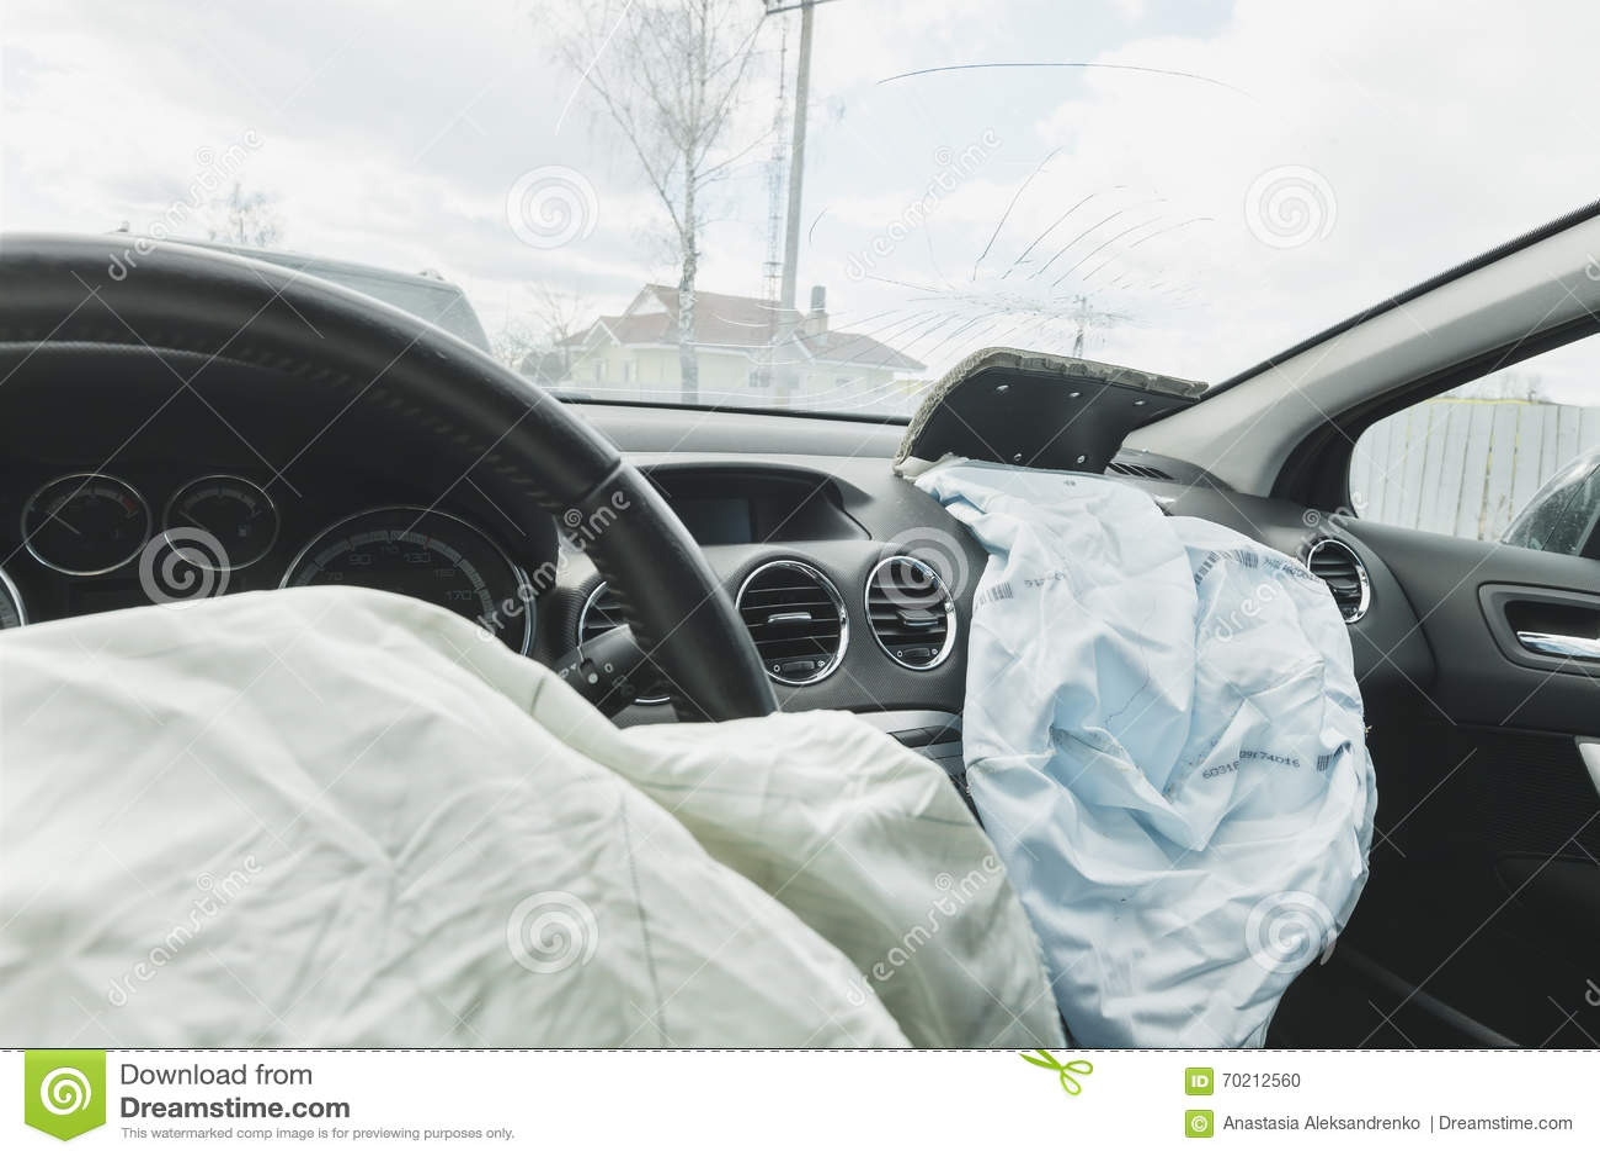 airbag d 39 accident de voiture bleu airbag d 39 inscription photo stock image 70212560. Black Bedroom Furniture Sets. Home Design Ideas